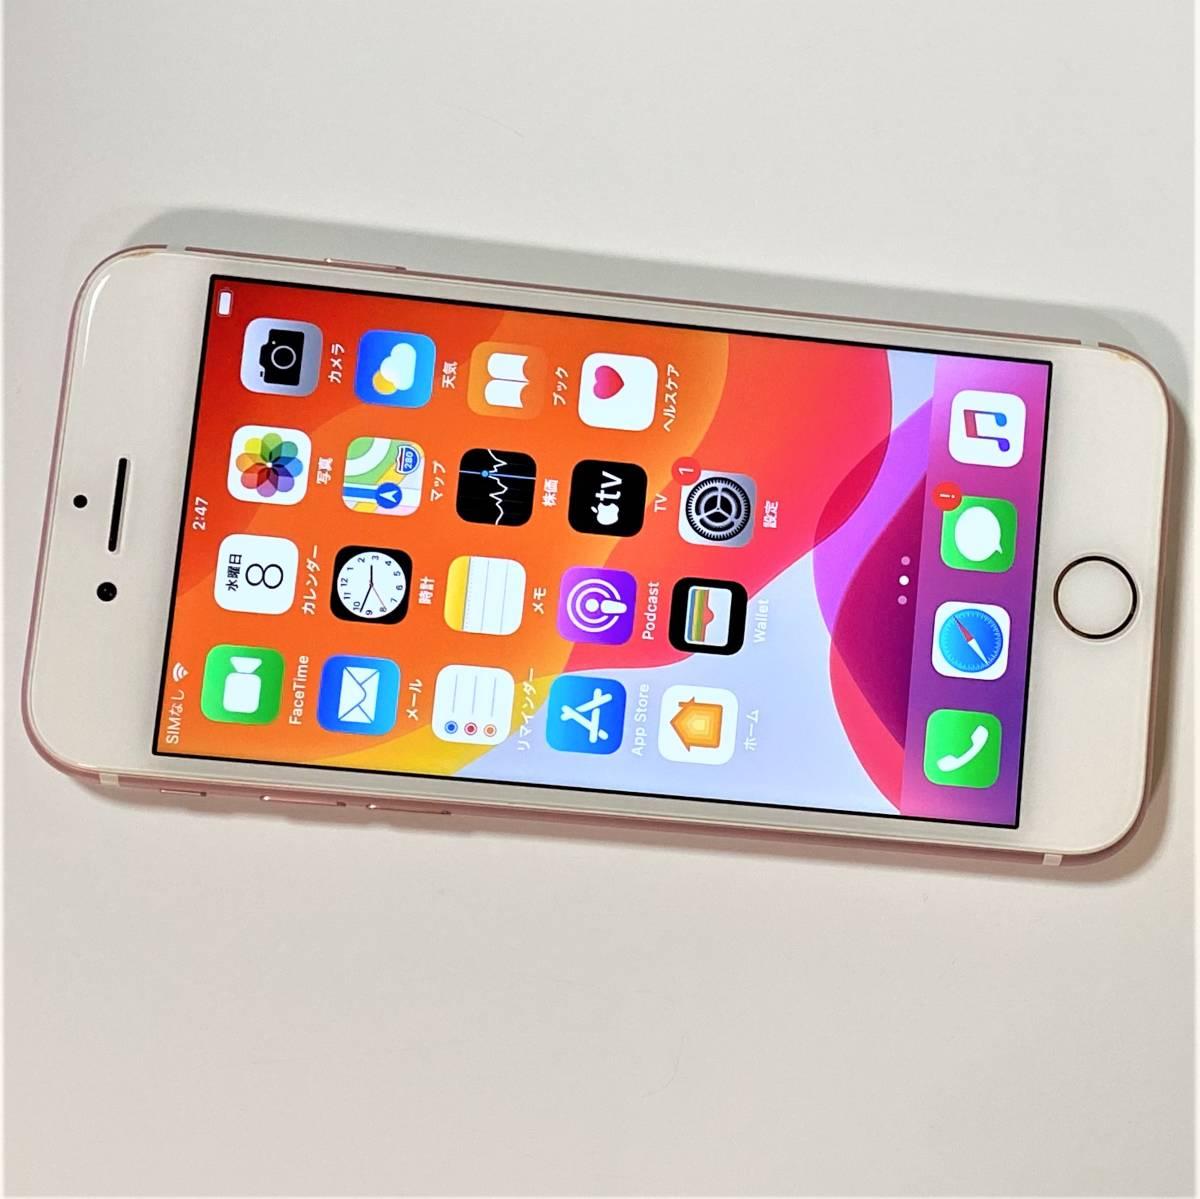 SIMフリー iPhone 7 ローズゴールド 32GB MNCJ2J/A iOS13.5.1 docomo 格安SIM MVNO 海外利用可能 アクティベーションロック解除済